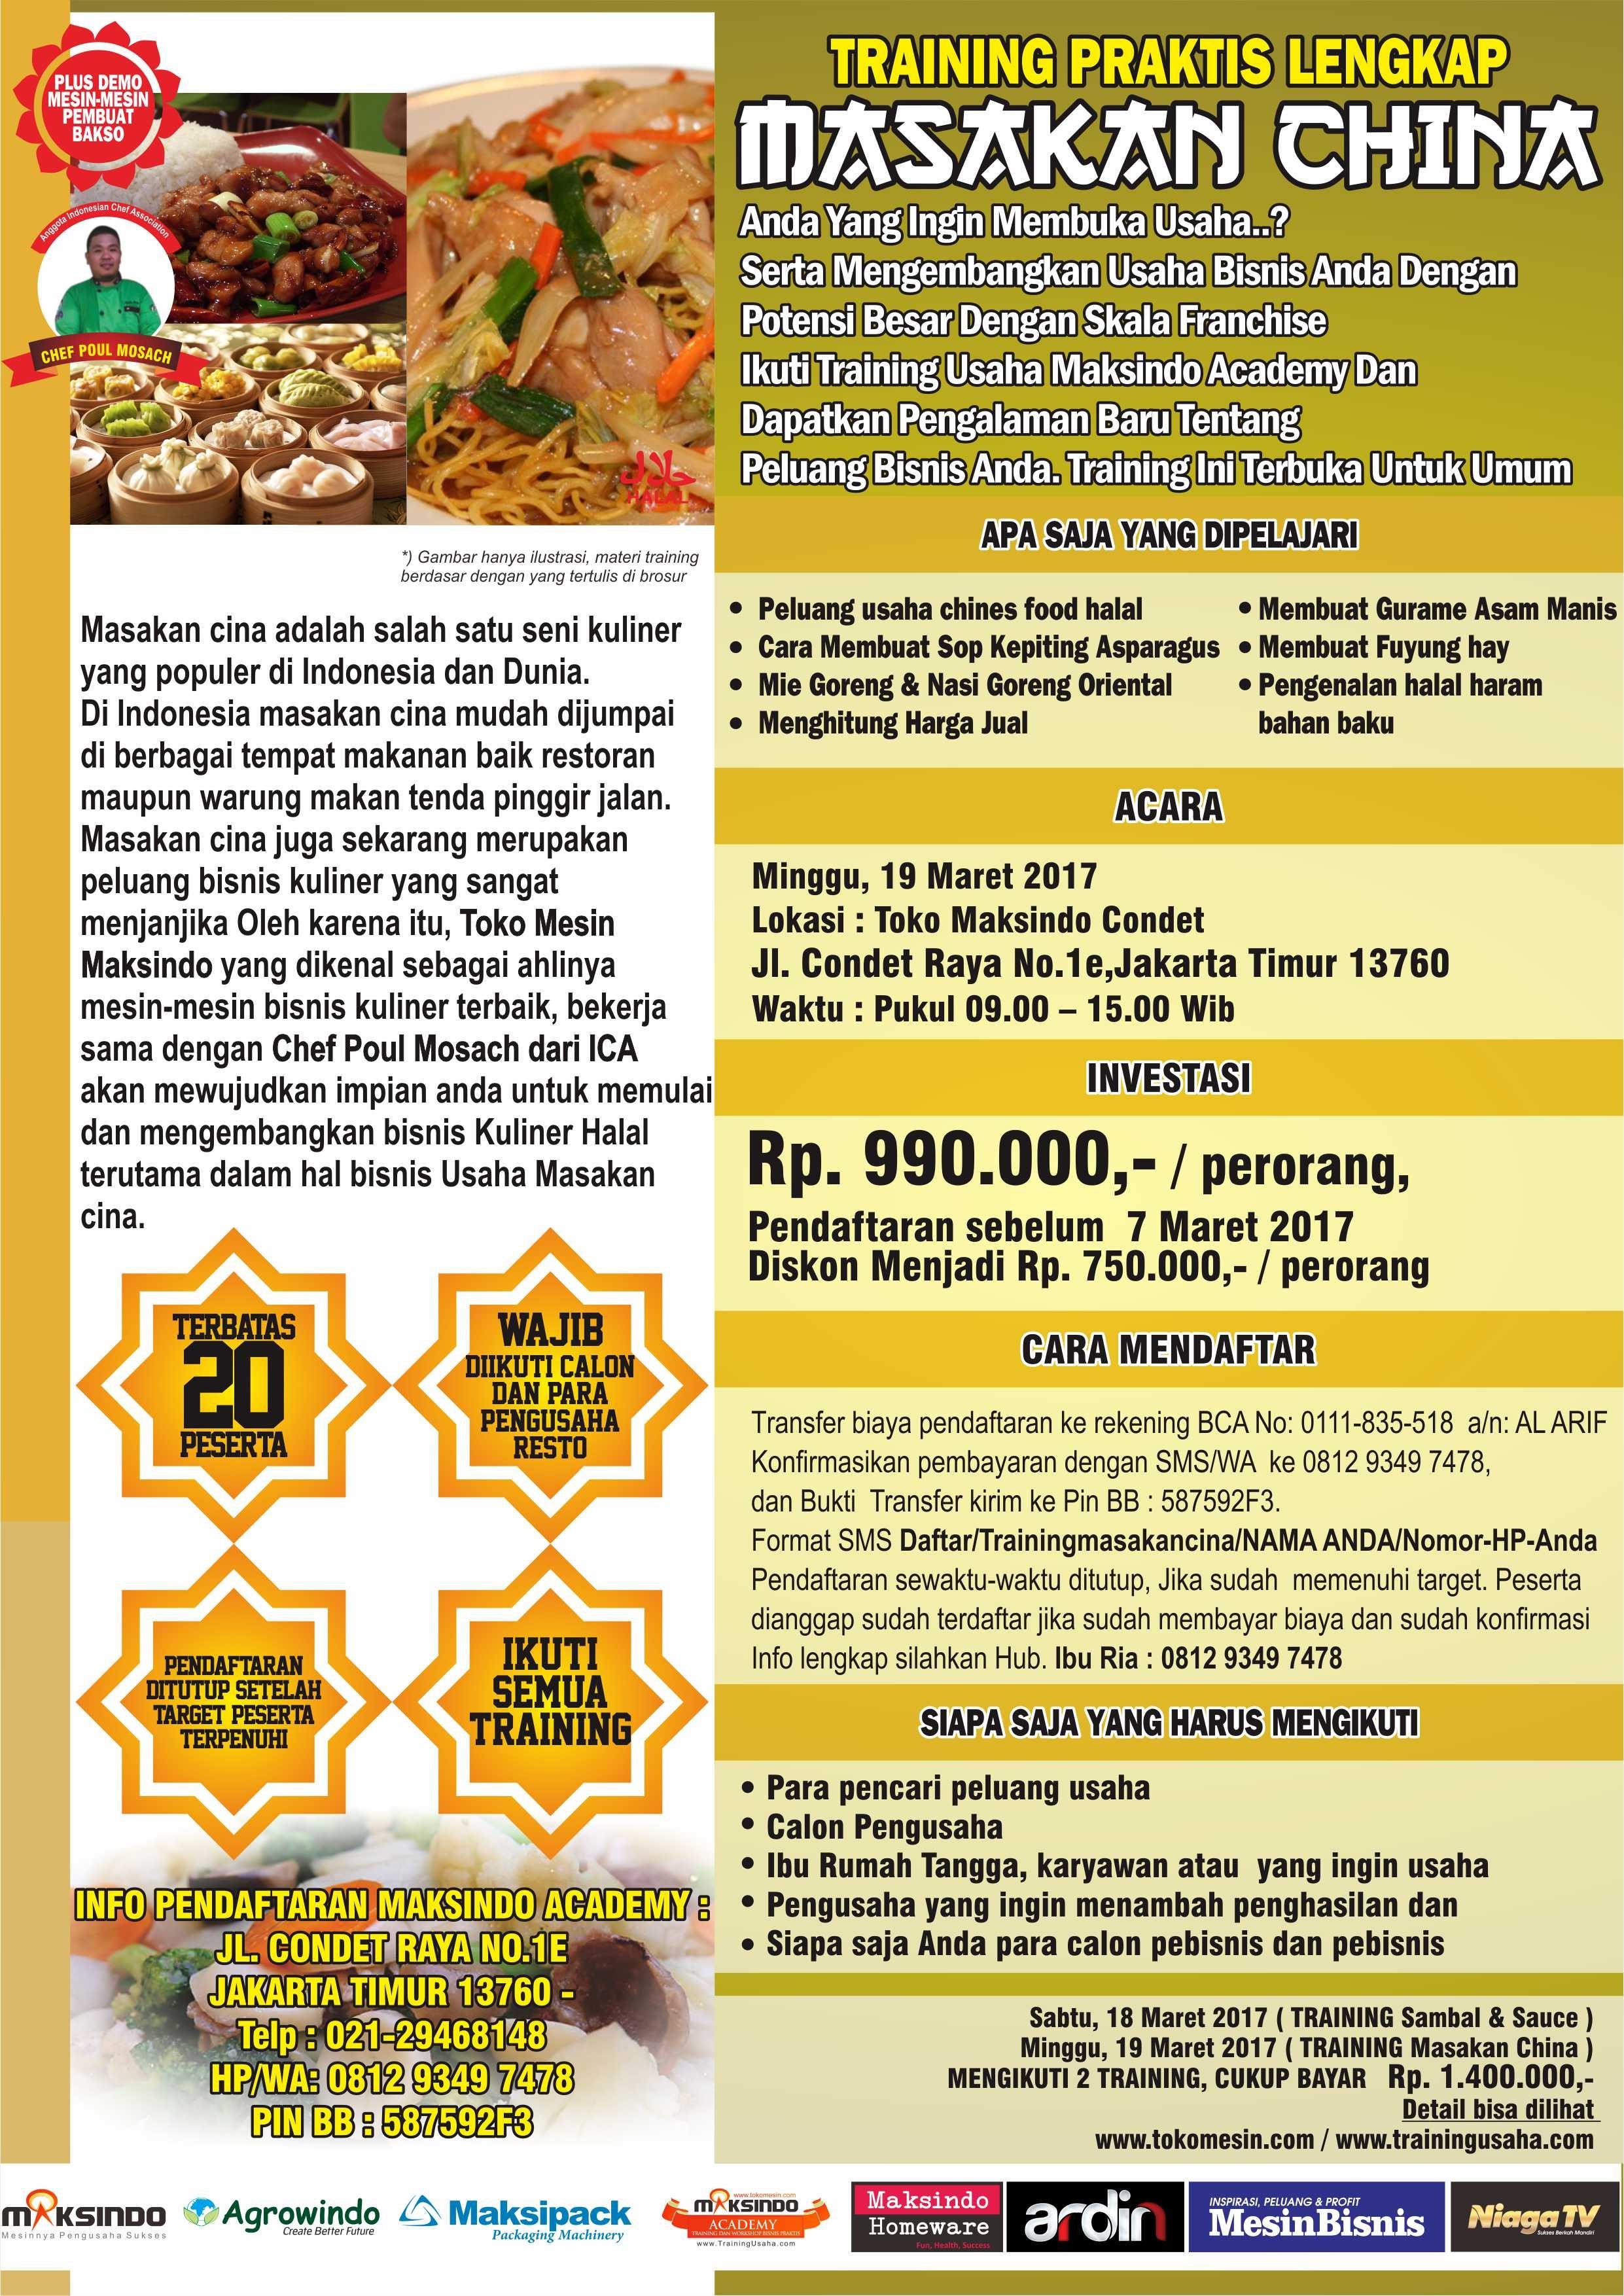 19-3-2017 TRAINING MASAKAN CHINA (1)